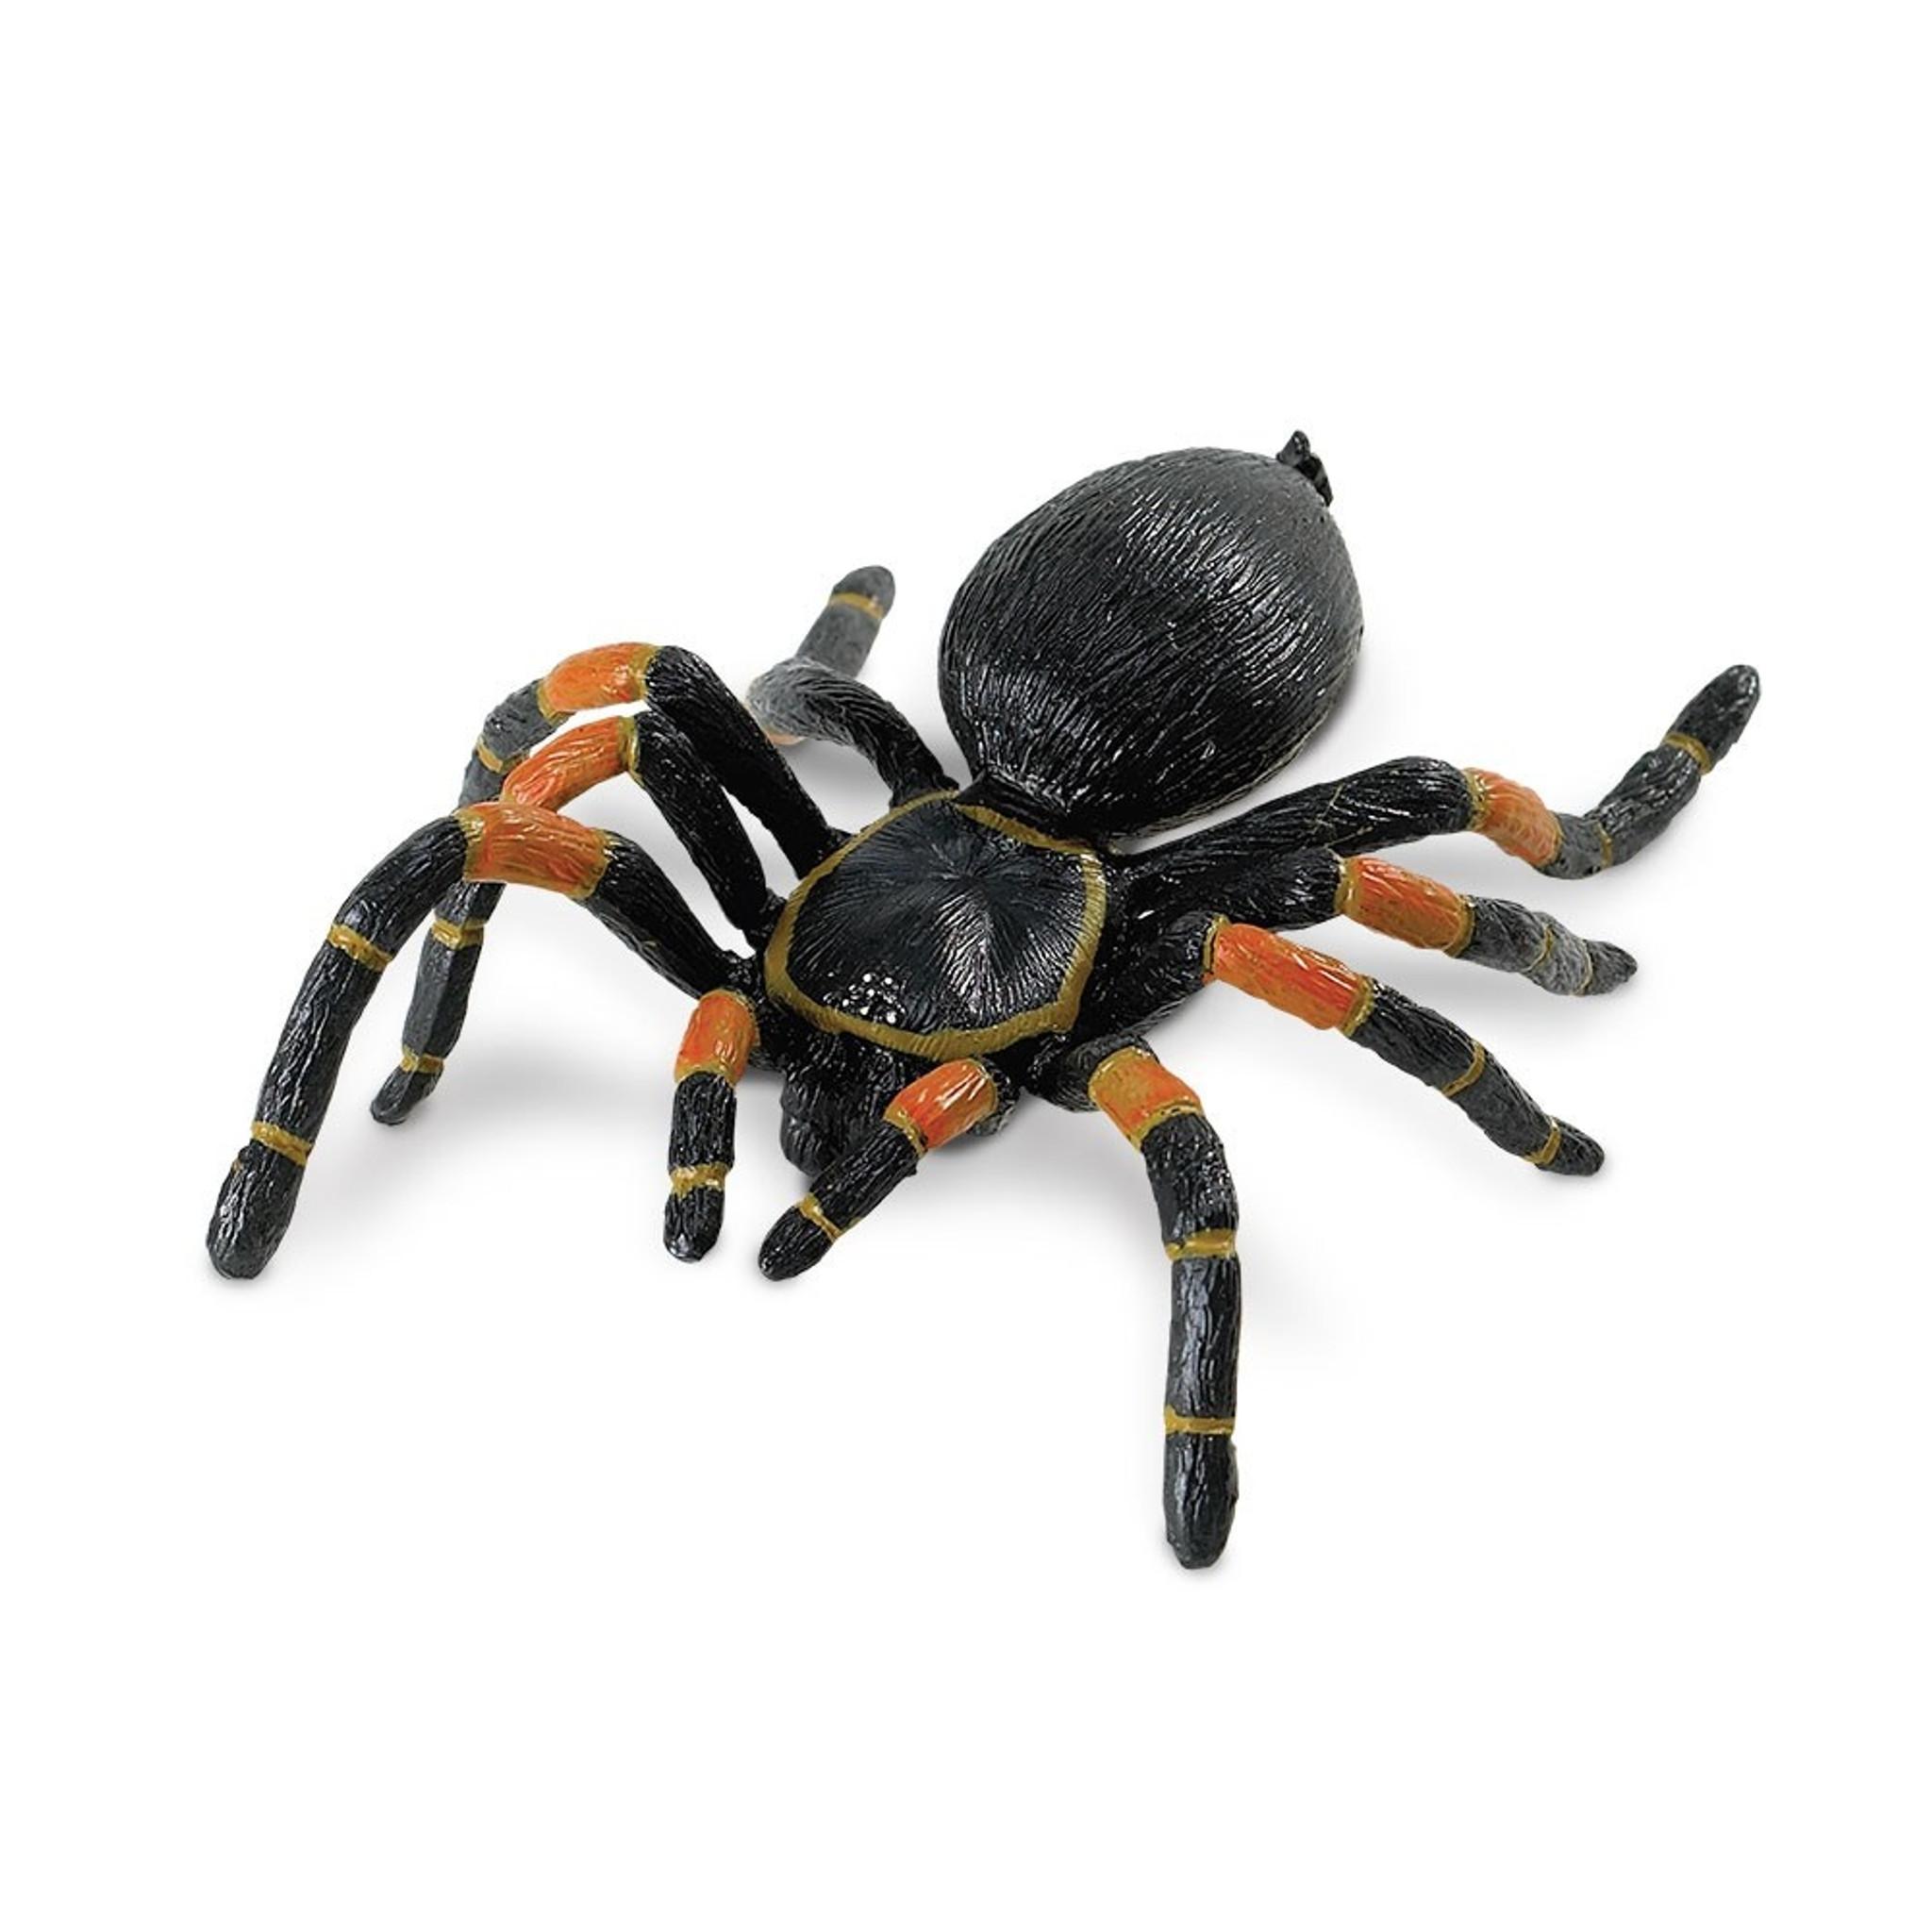 Tarantula Stuffed Animal, Safari Ltd Orange Kneed Tarantula 542006 Incredible Creatures